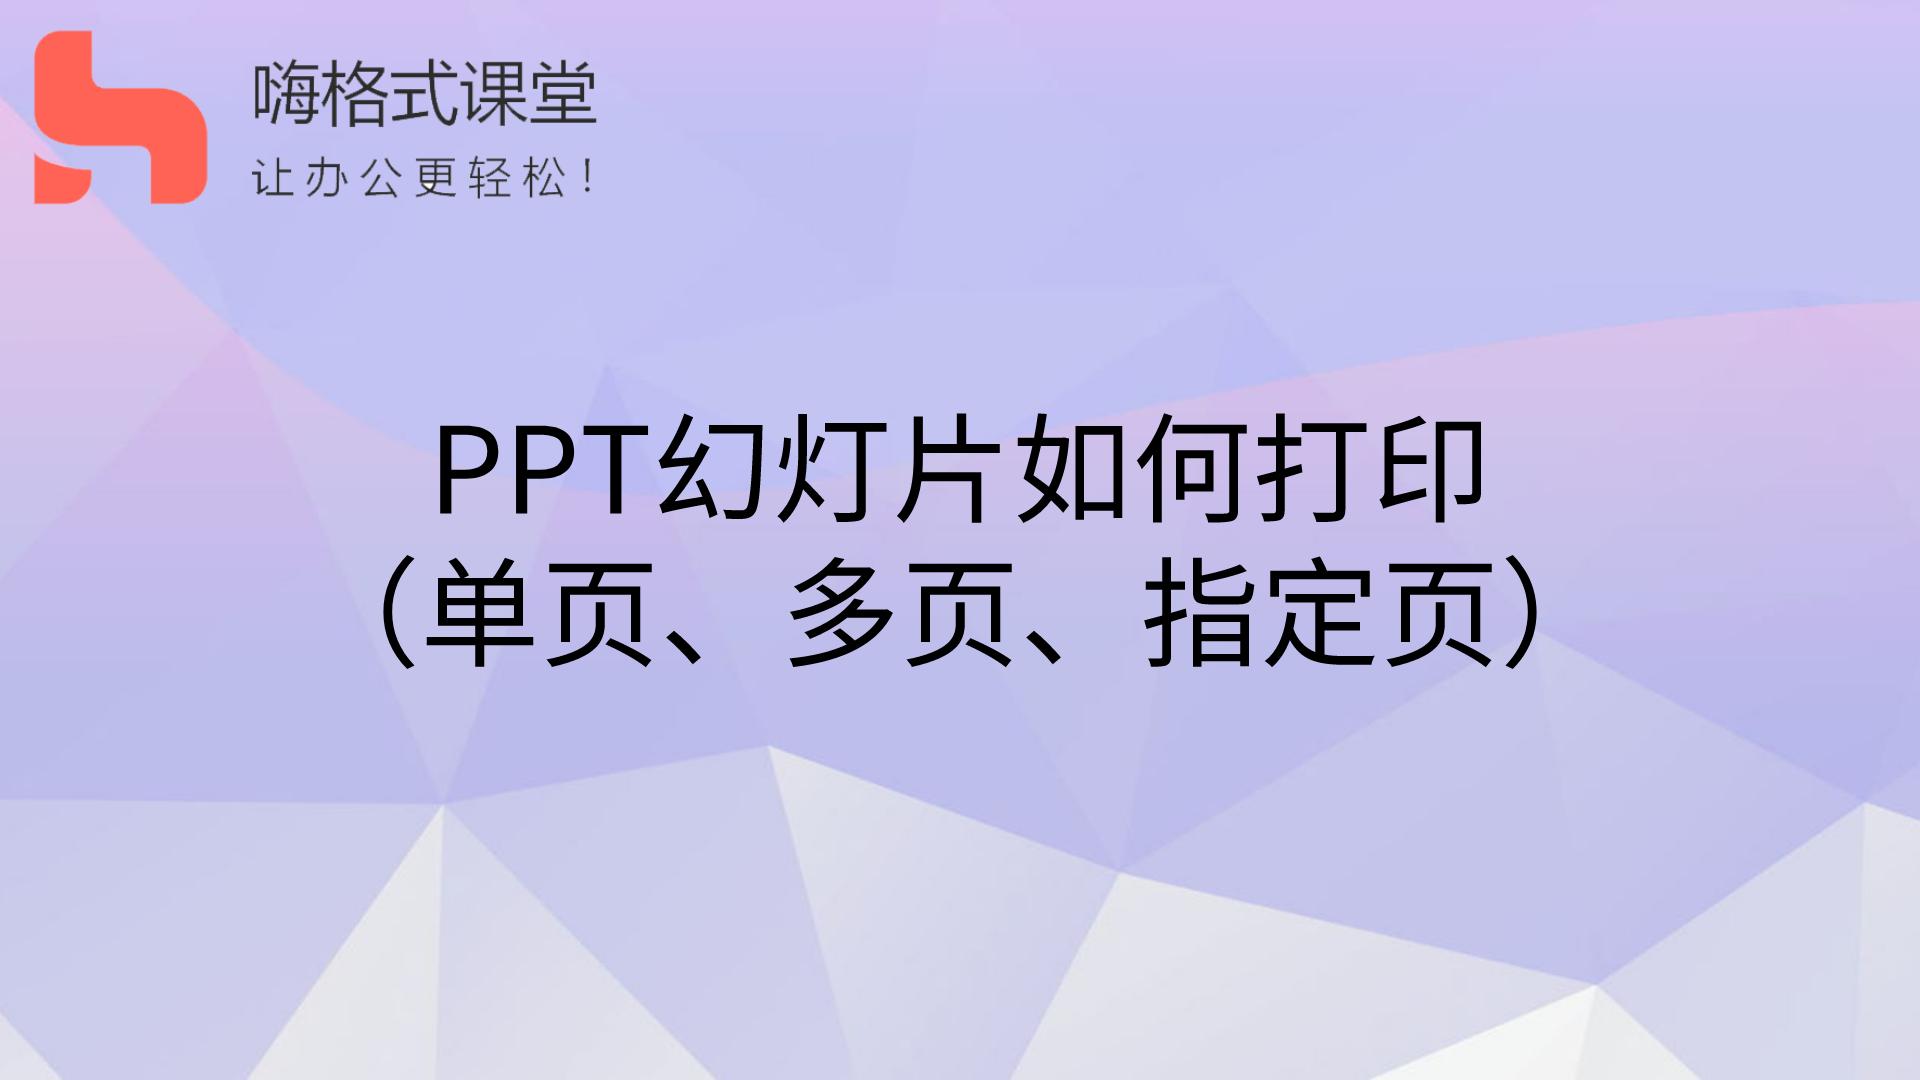 PPT幻灯片如何打印(单页,多页,指定页)